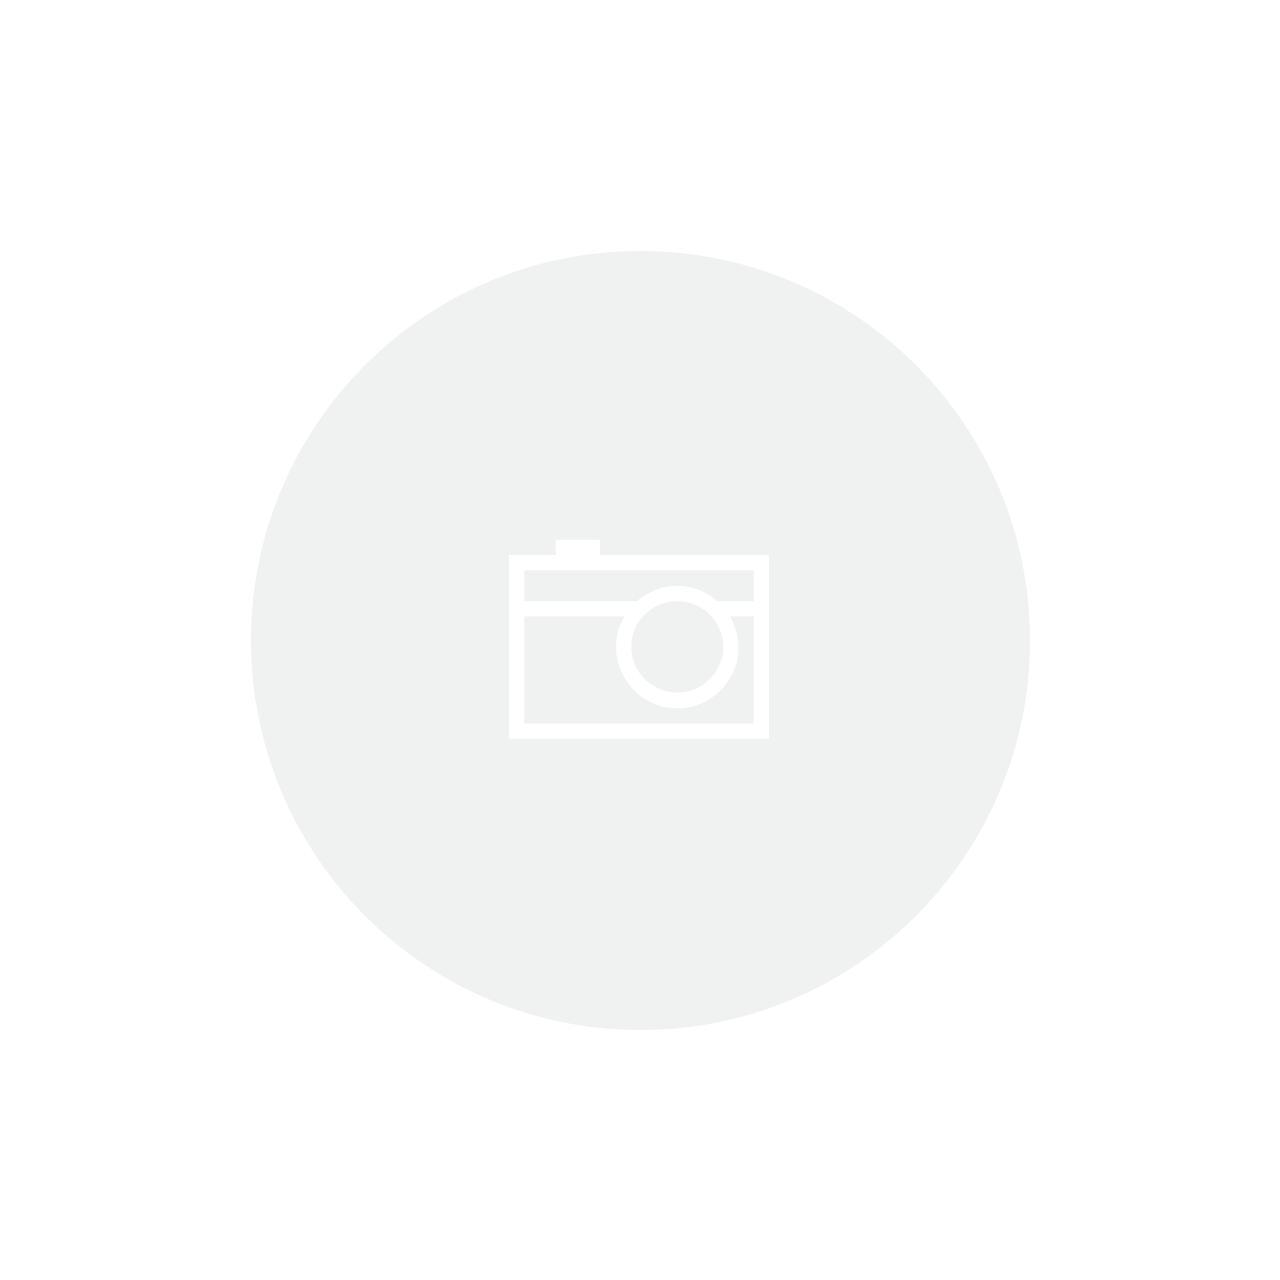 Caçarola Funda Inox Ø16Cm Professional Tramontina